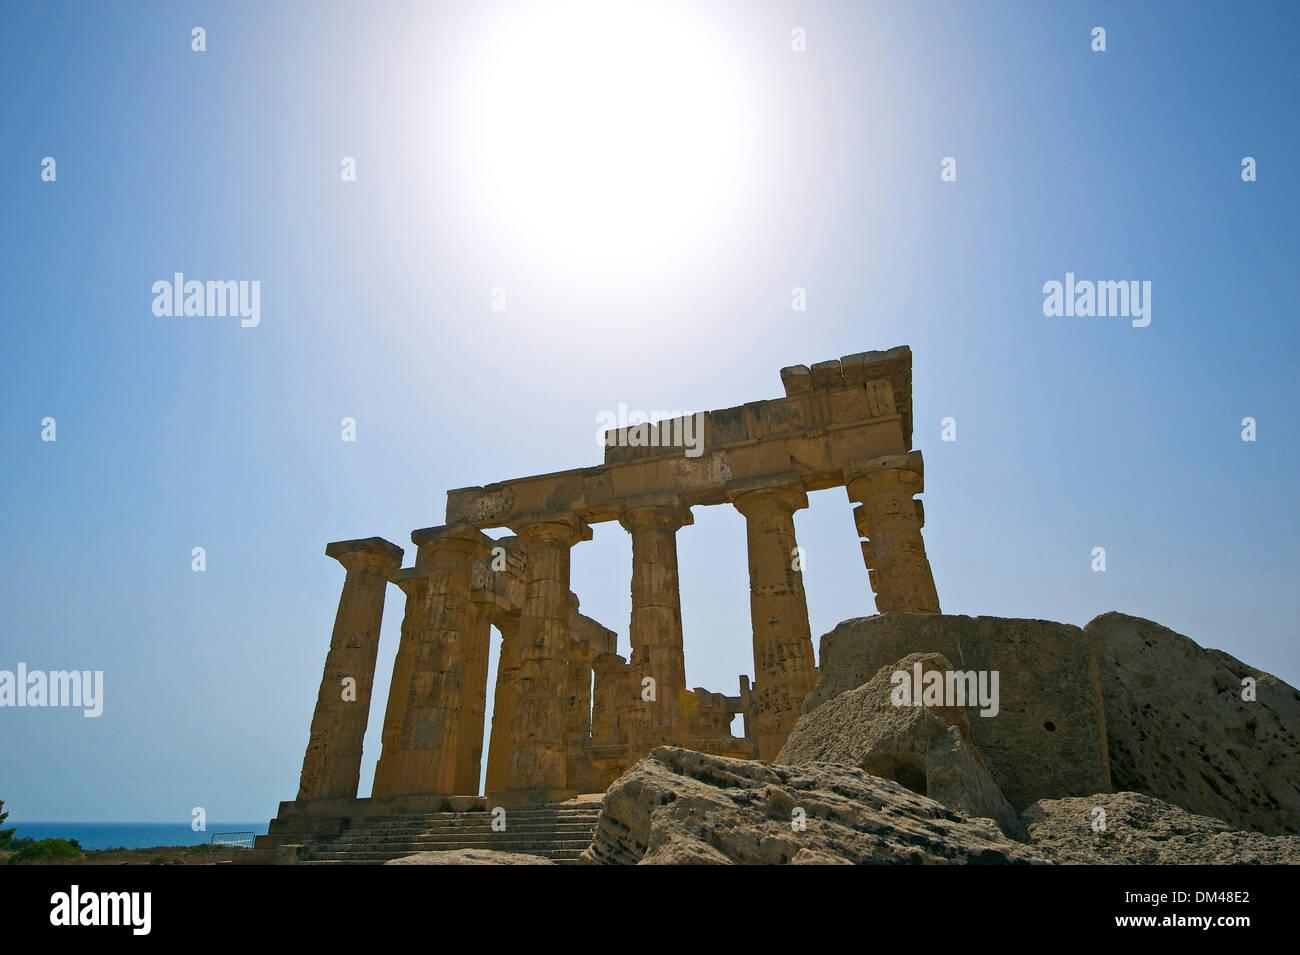 Sizilien-Italien-Süd-Italien-Europa Insel Tempel der Hera Selinunt Tempelarchitektur Baugeschichte historische Gebäude Stockbild